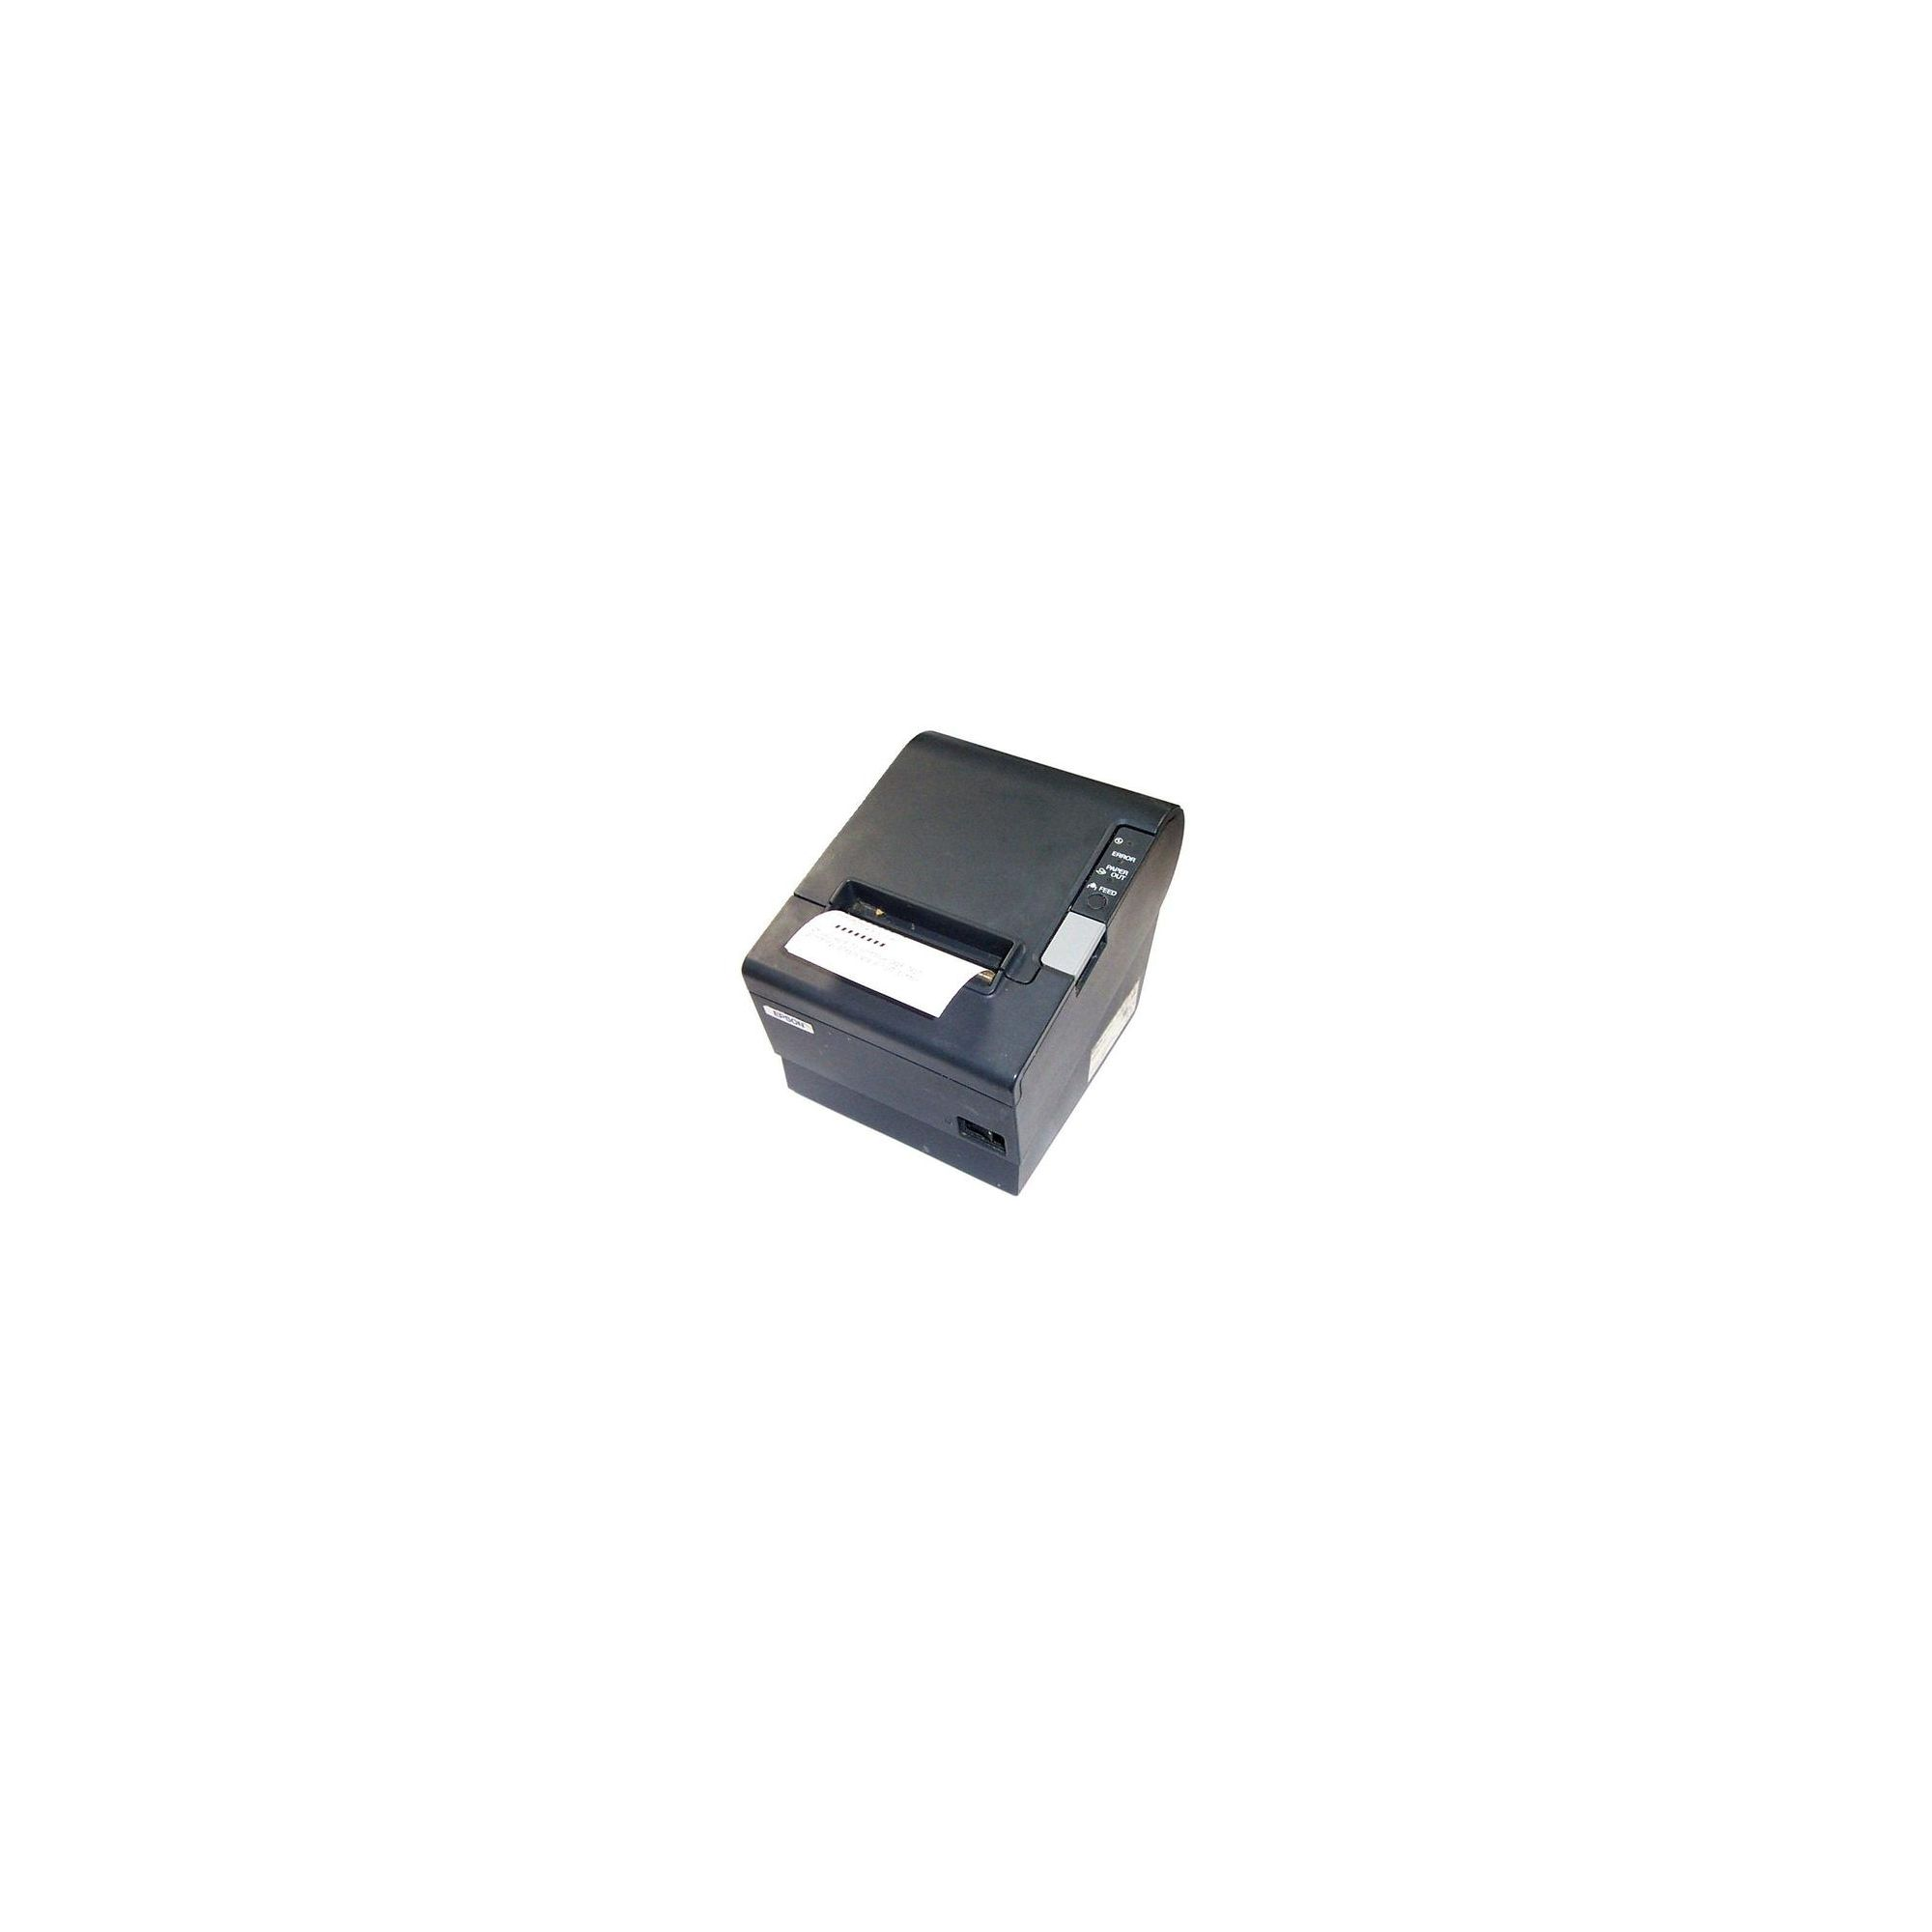 Epson TM-T88IV Thermal Receipt Printer at Tesco Direct